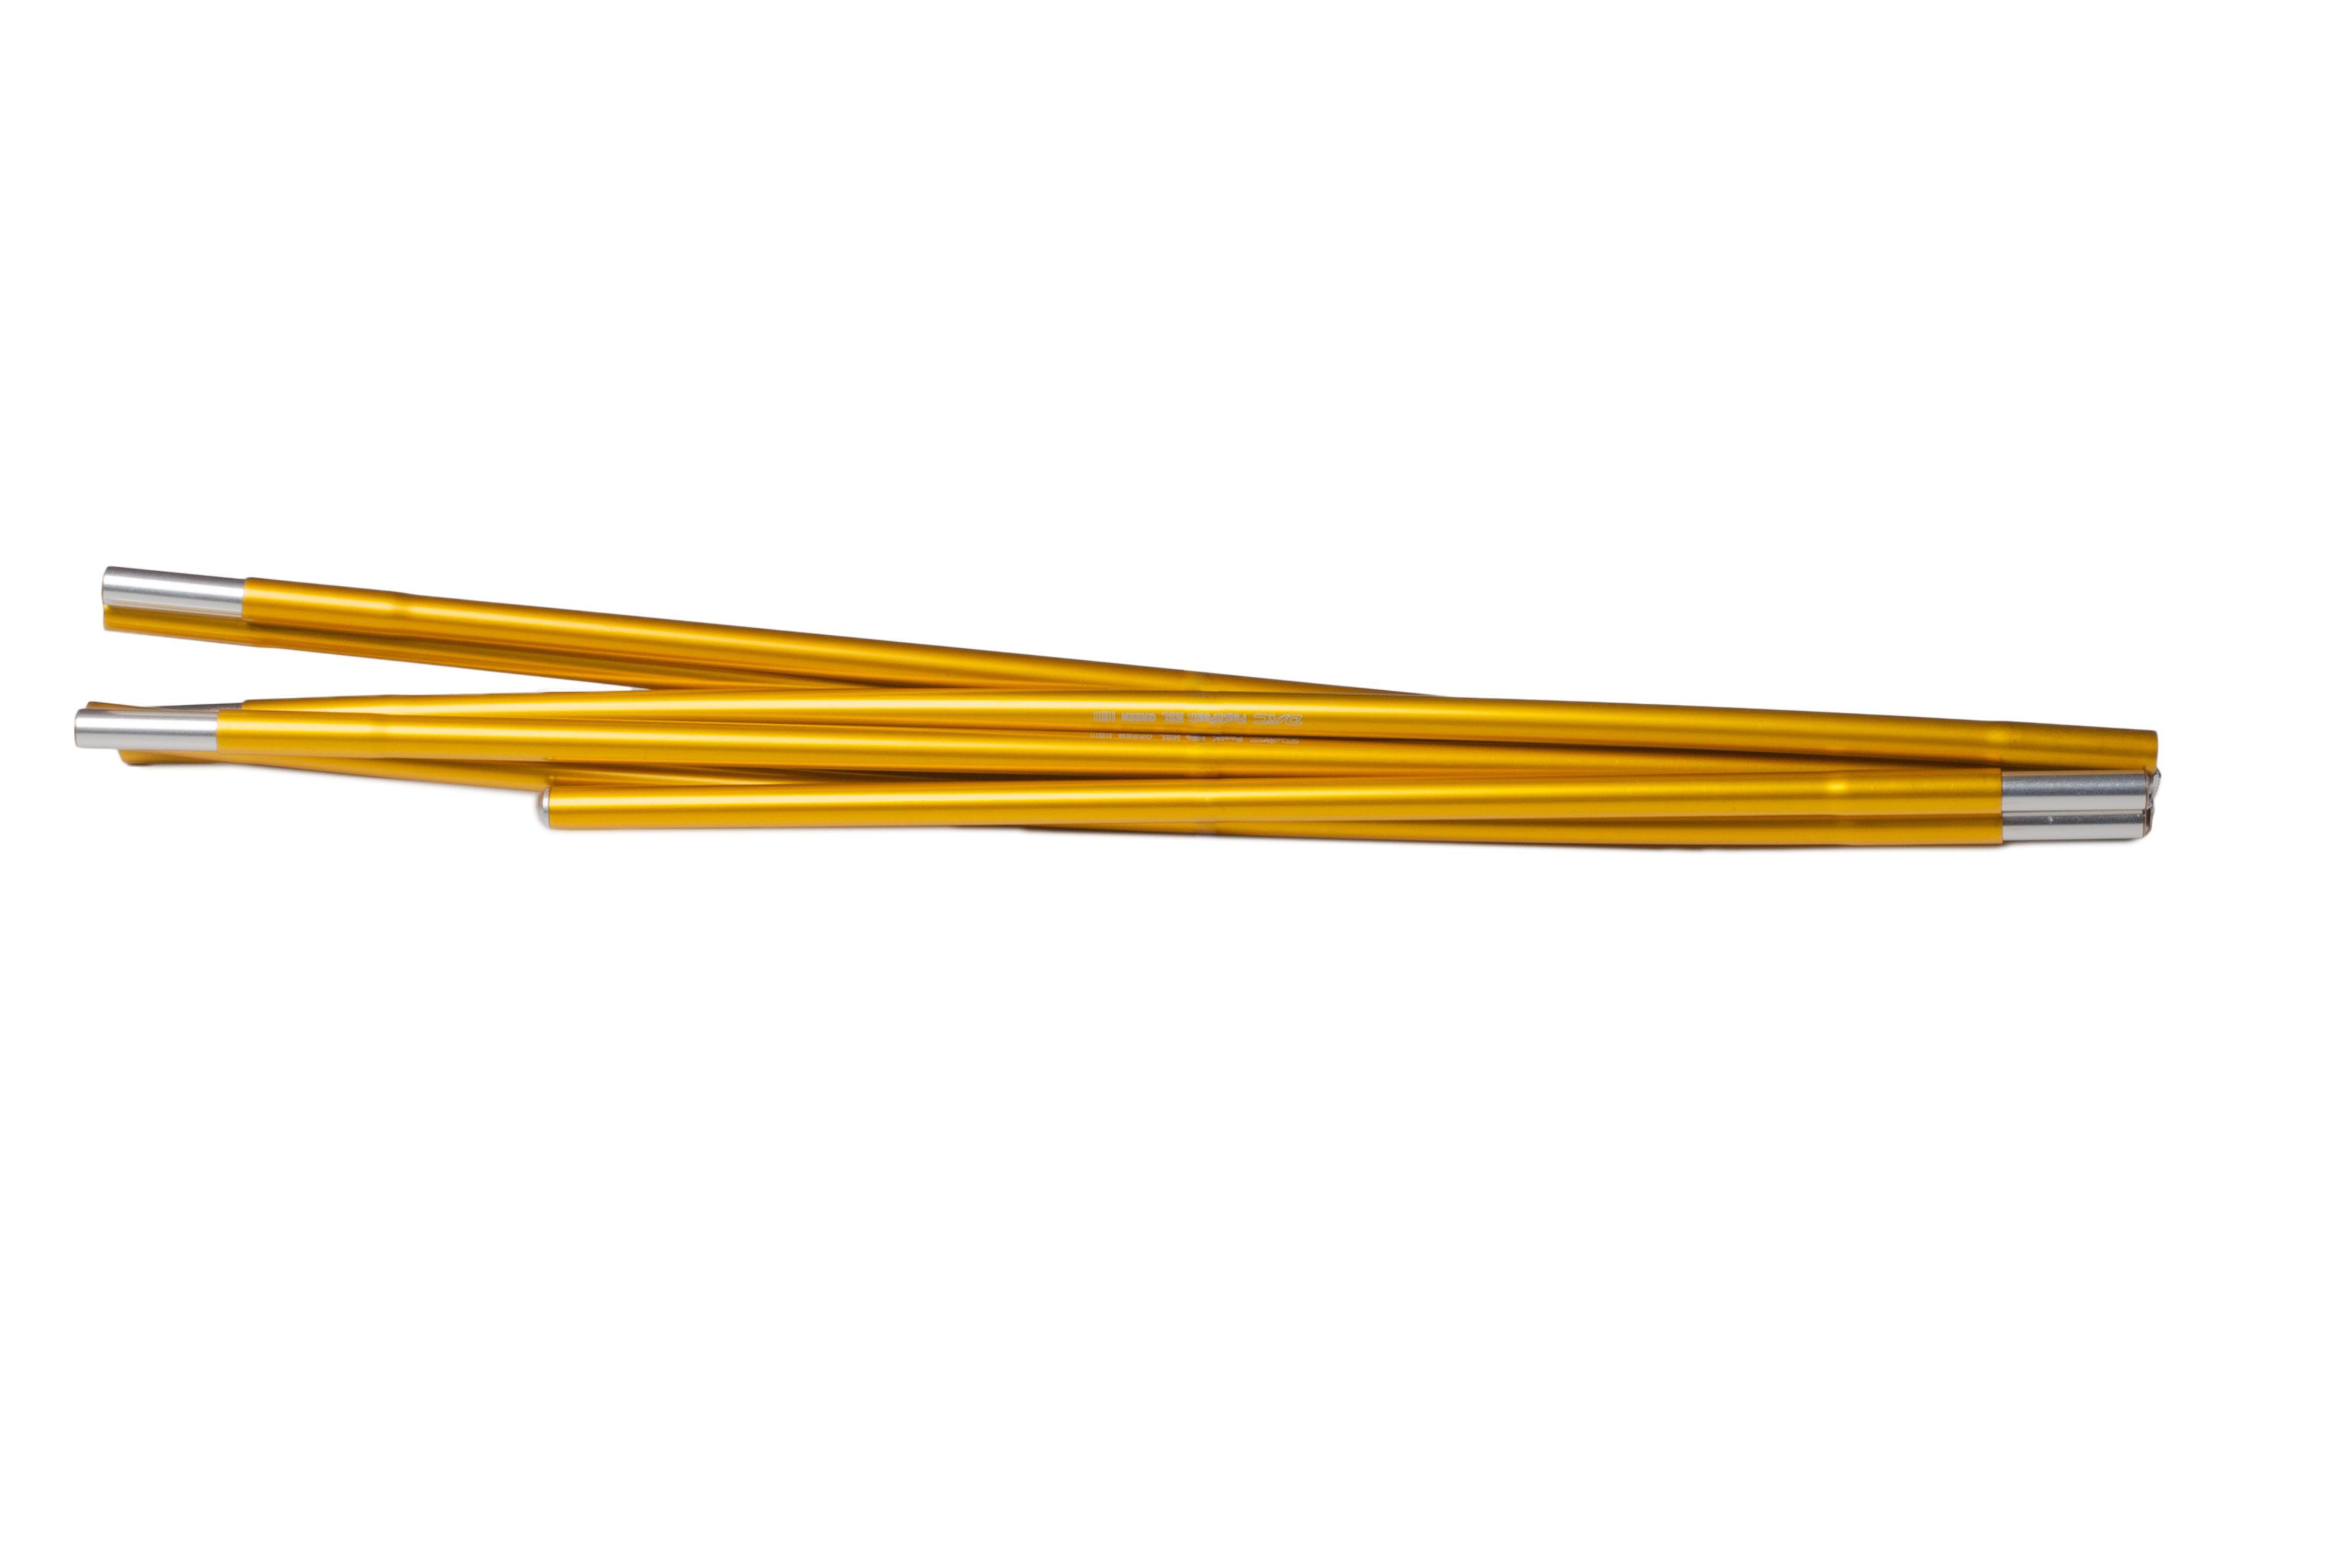 Poles 305 cm x 9 mm Nallo 2 / 2GT, Kaituma 2 / 2GT